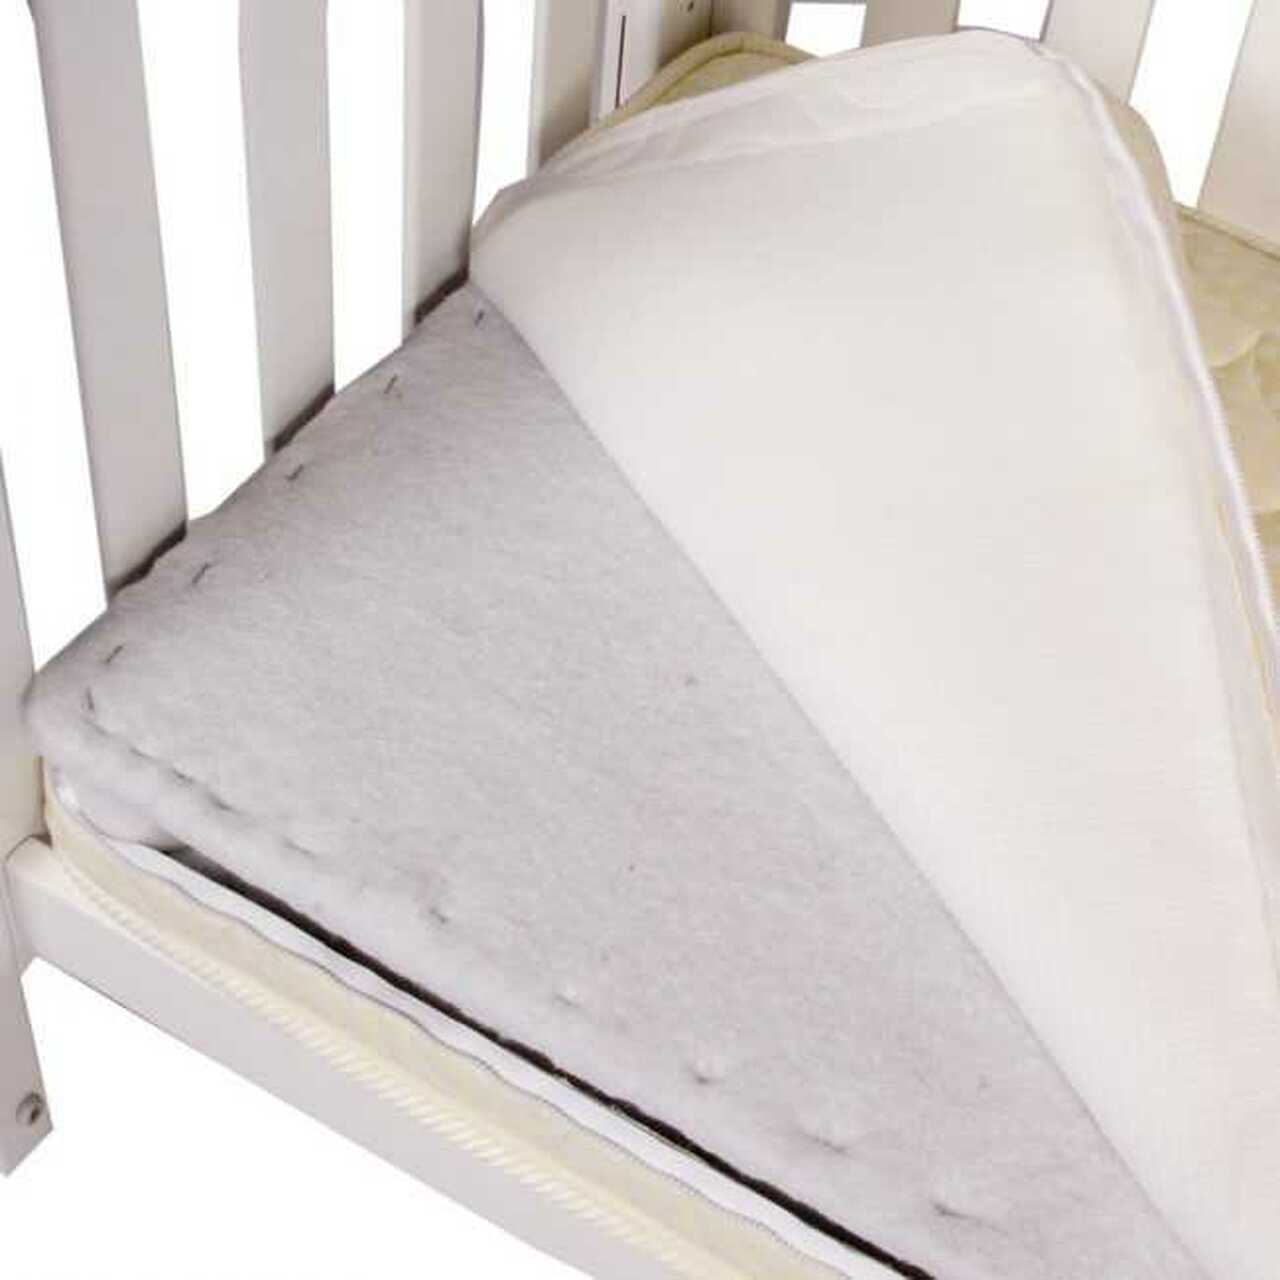 Babyhood Orthopedic Breathe Eze Innerspring Mattress Vend Uncategorized 199